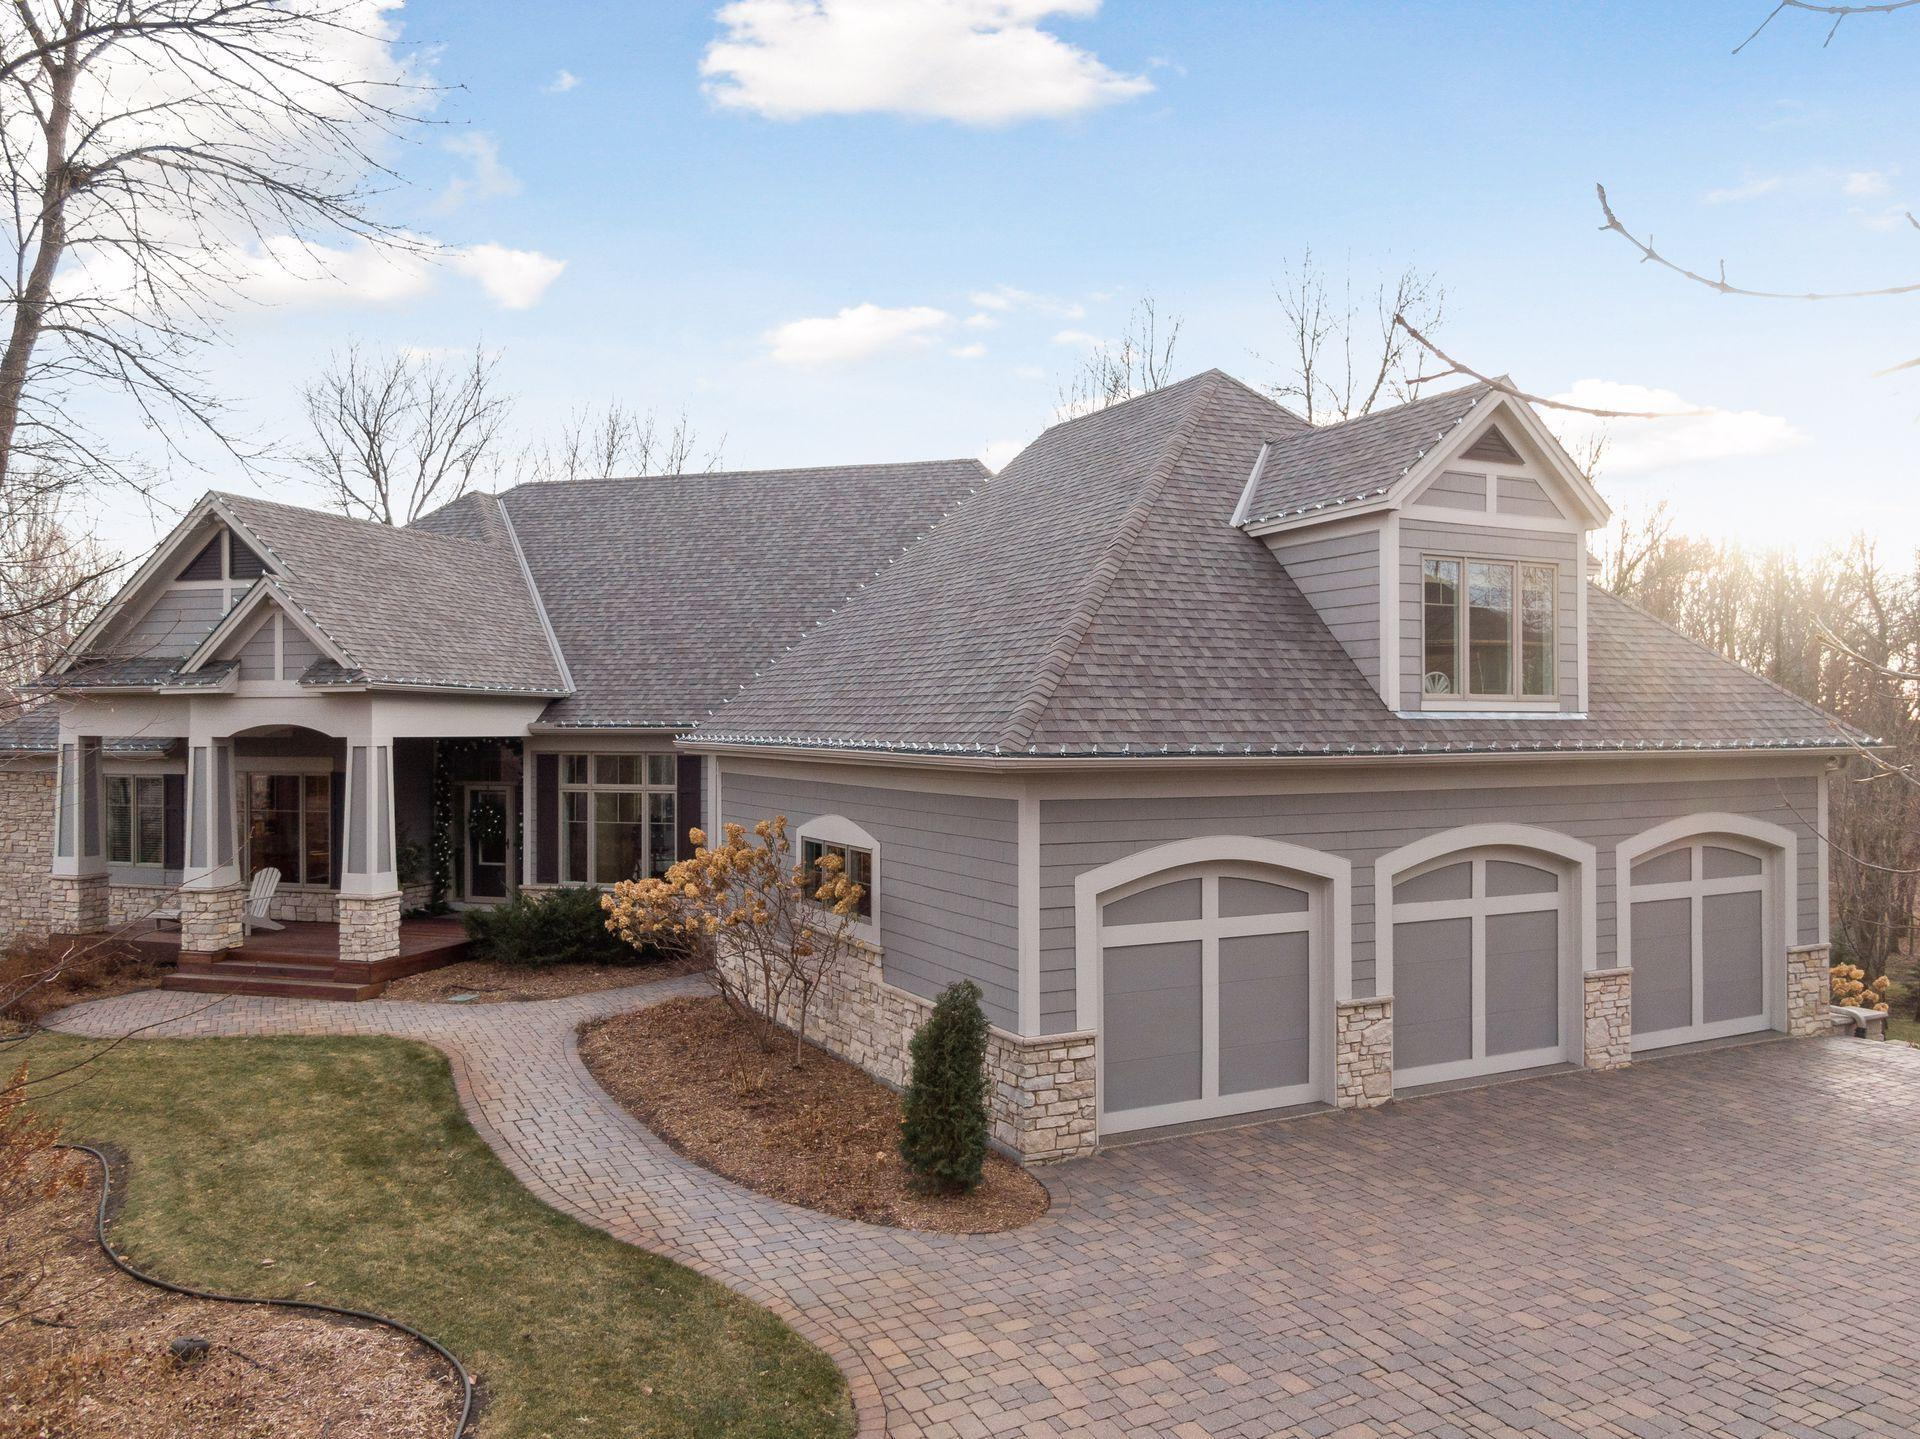 21080 Ridgewood Trail Property Photo - Lakeville, MN real estate listing